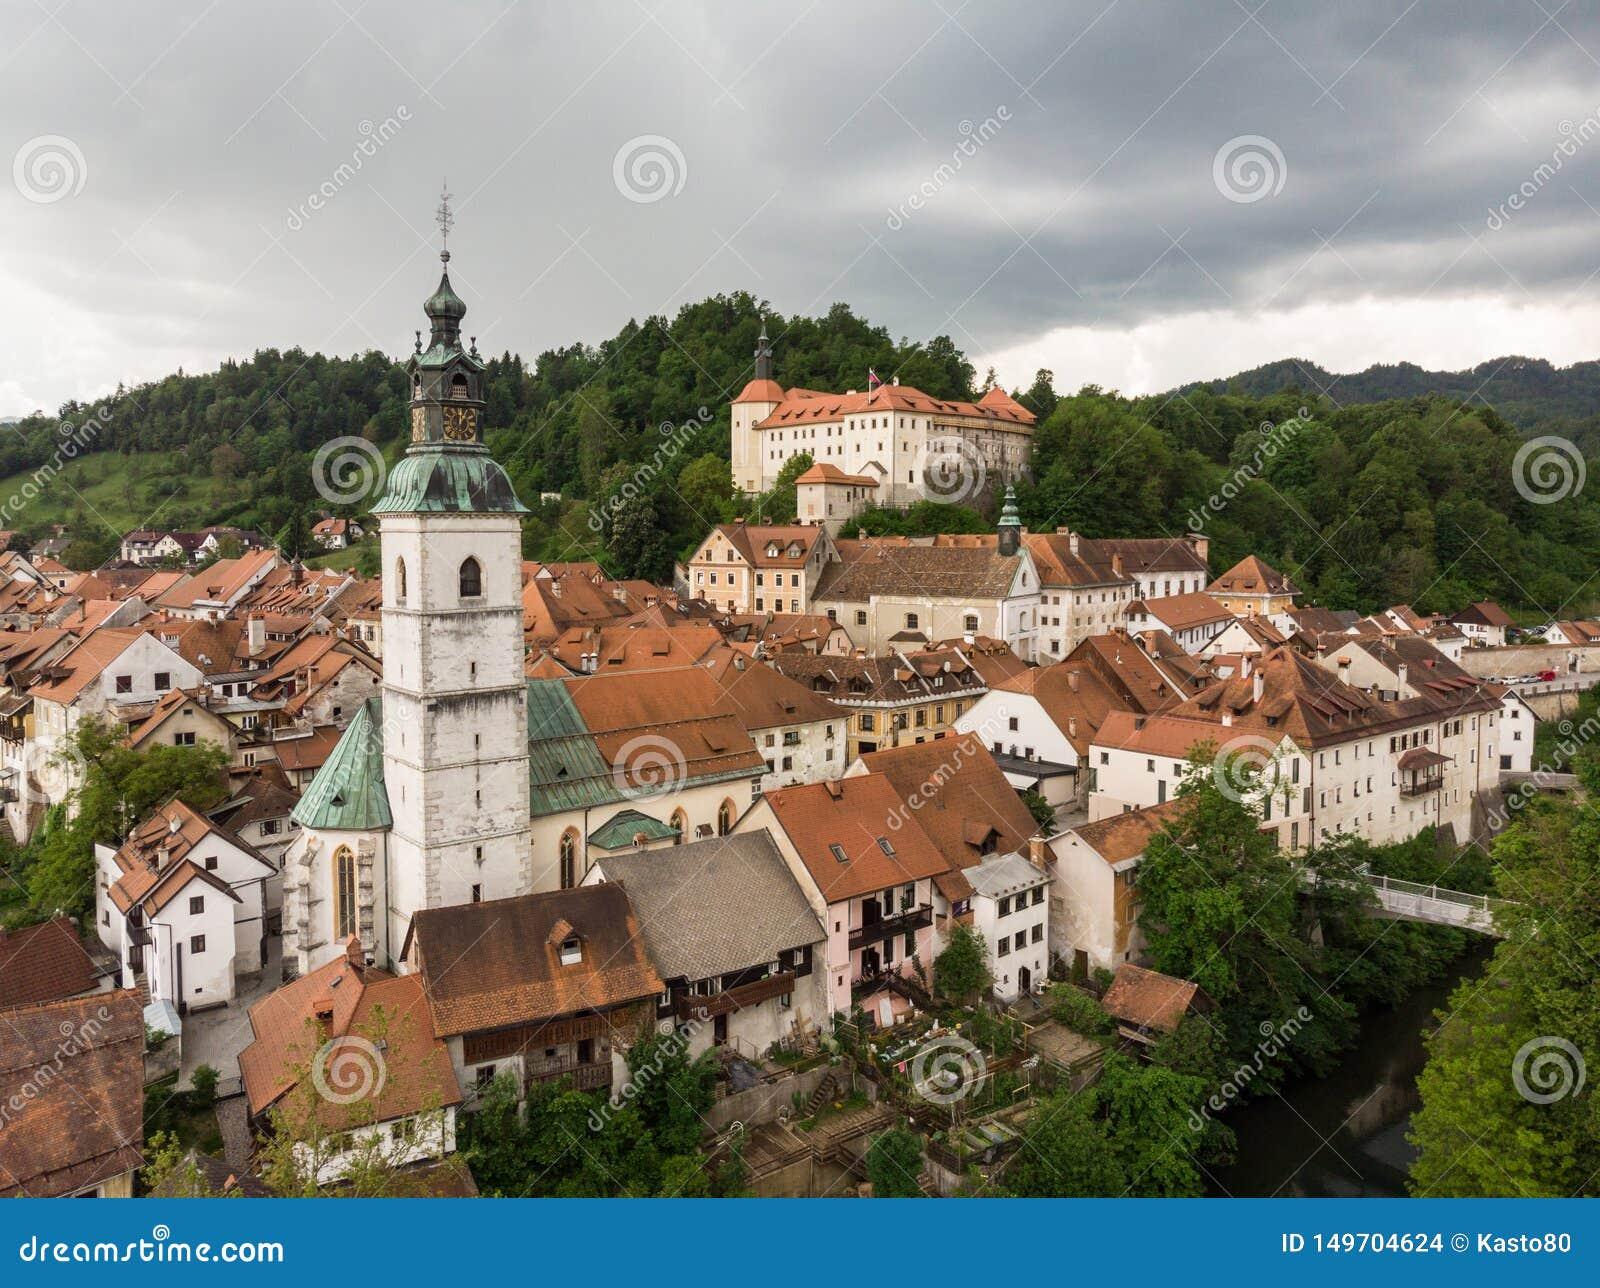 Castillo medieval en la ciudad vieja de Skofja Loka, Eslovenia